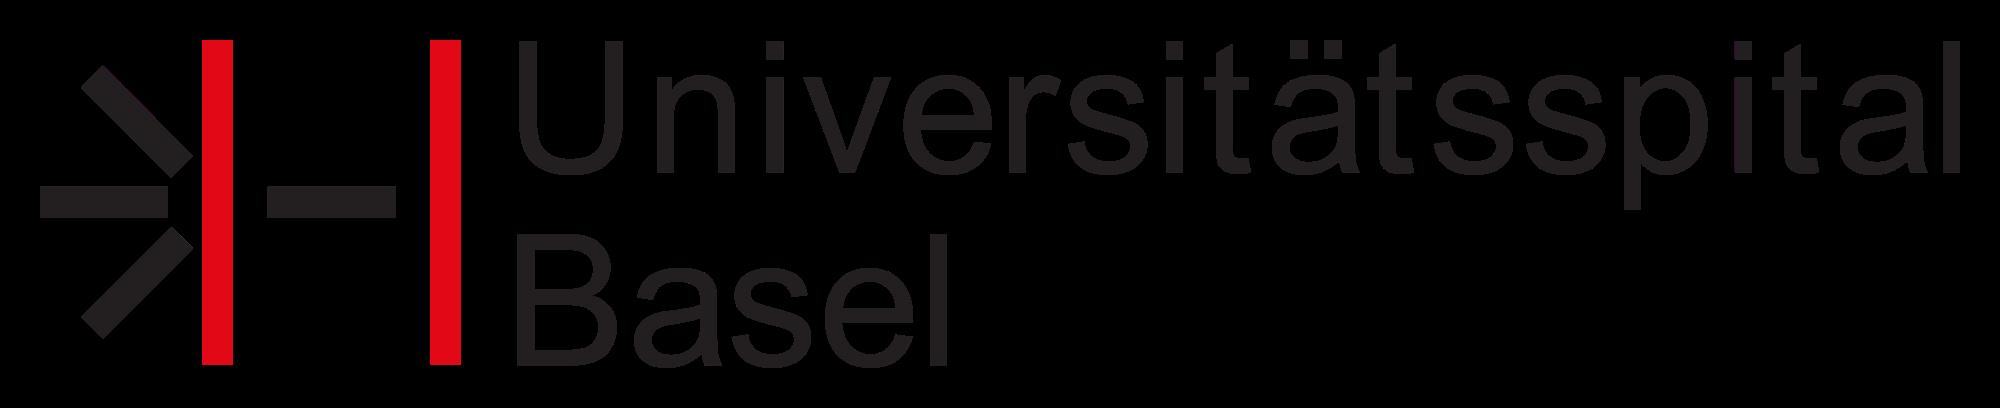 Basel Universitätsspital USB Hebammen